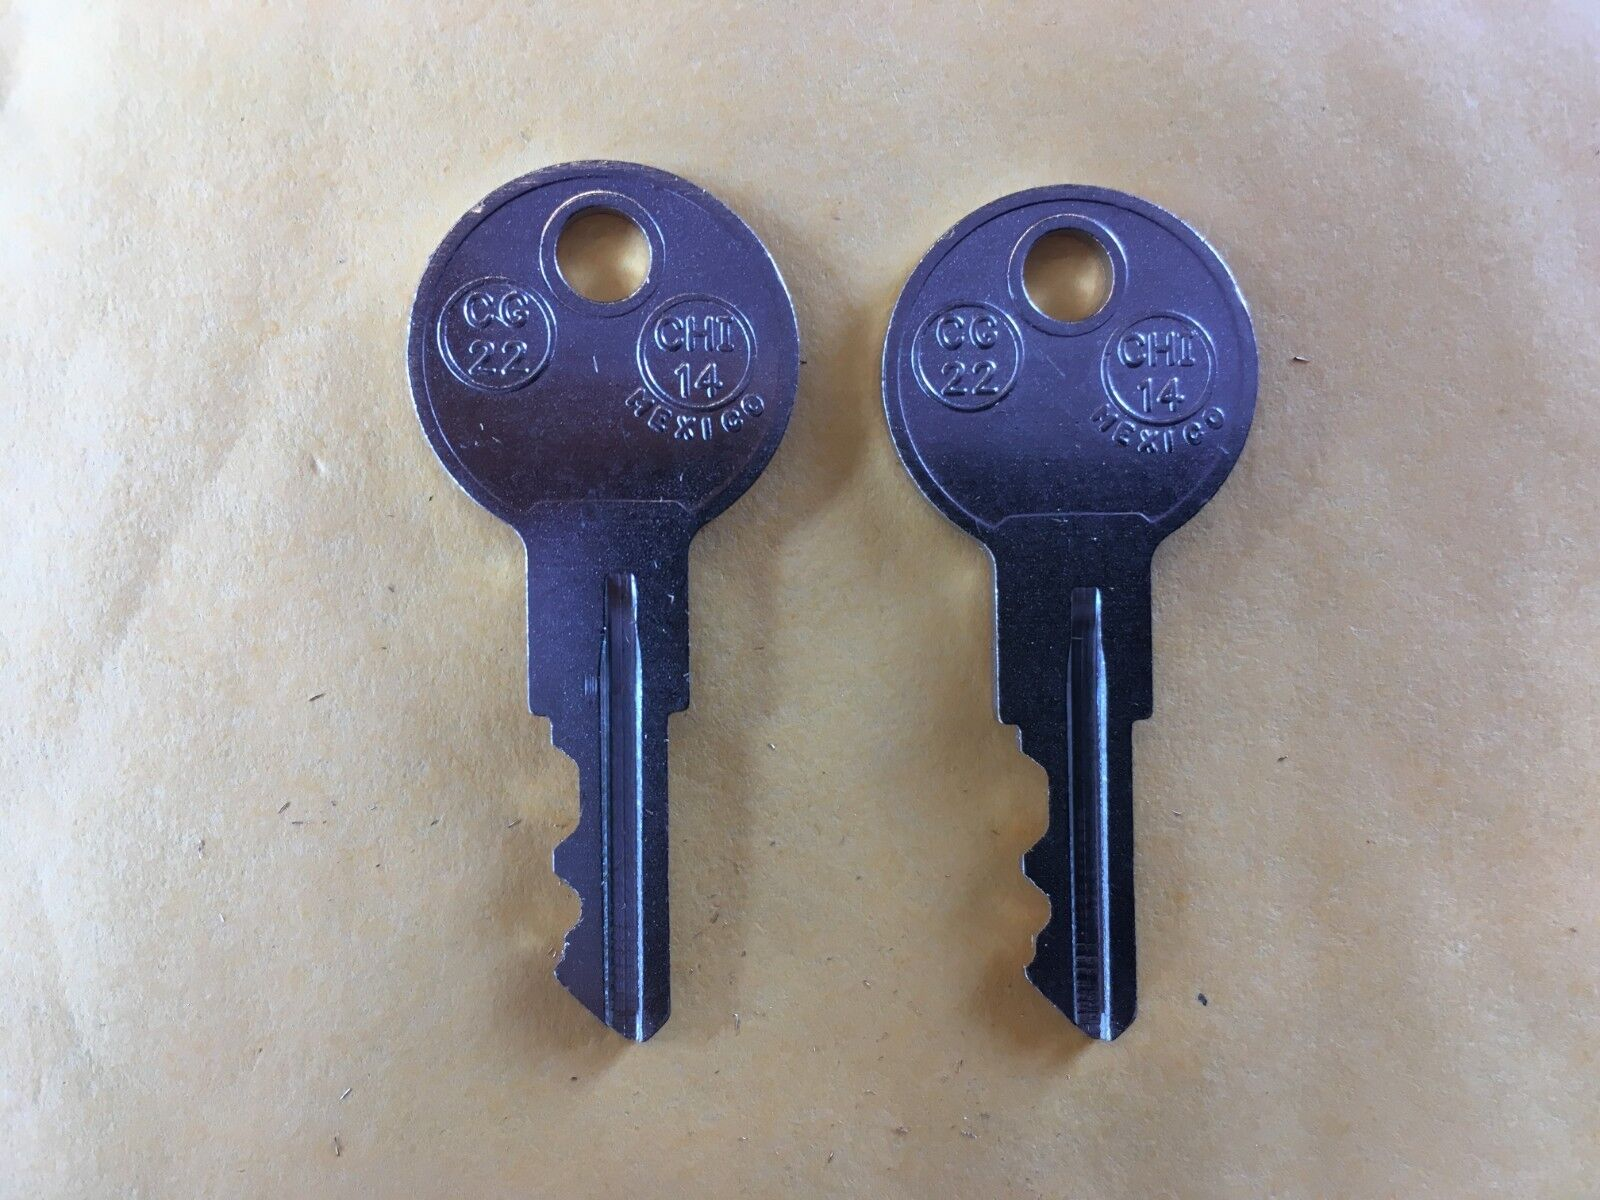 2 KEYS CRAFTSMAN TOOL BOX LL001-LL225 (LL1W-LL225W & LL1H-LL225H) toolbox key